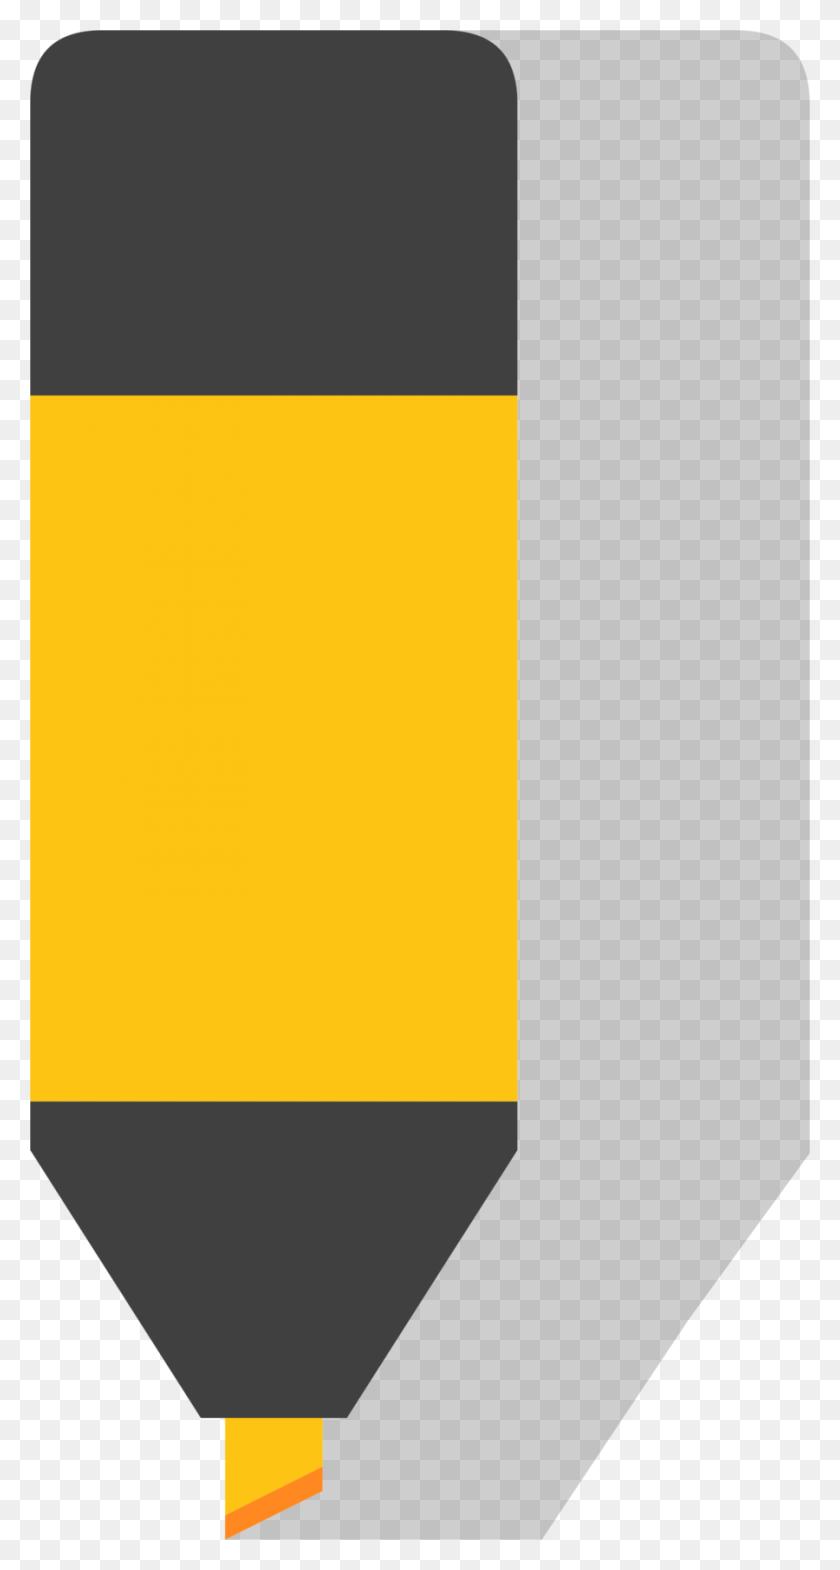 Marker Clip Art - Marker Pen Clipart - Free Transparent PNG Clipart Images  Download